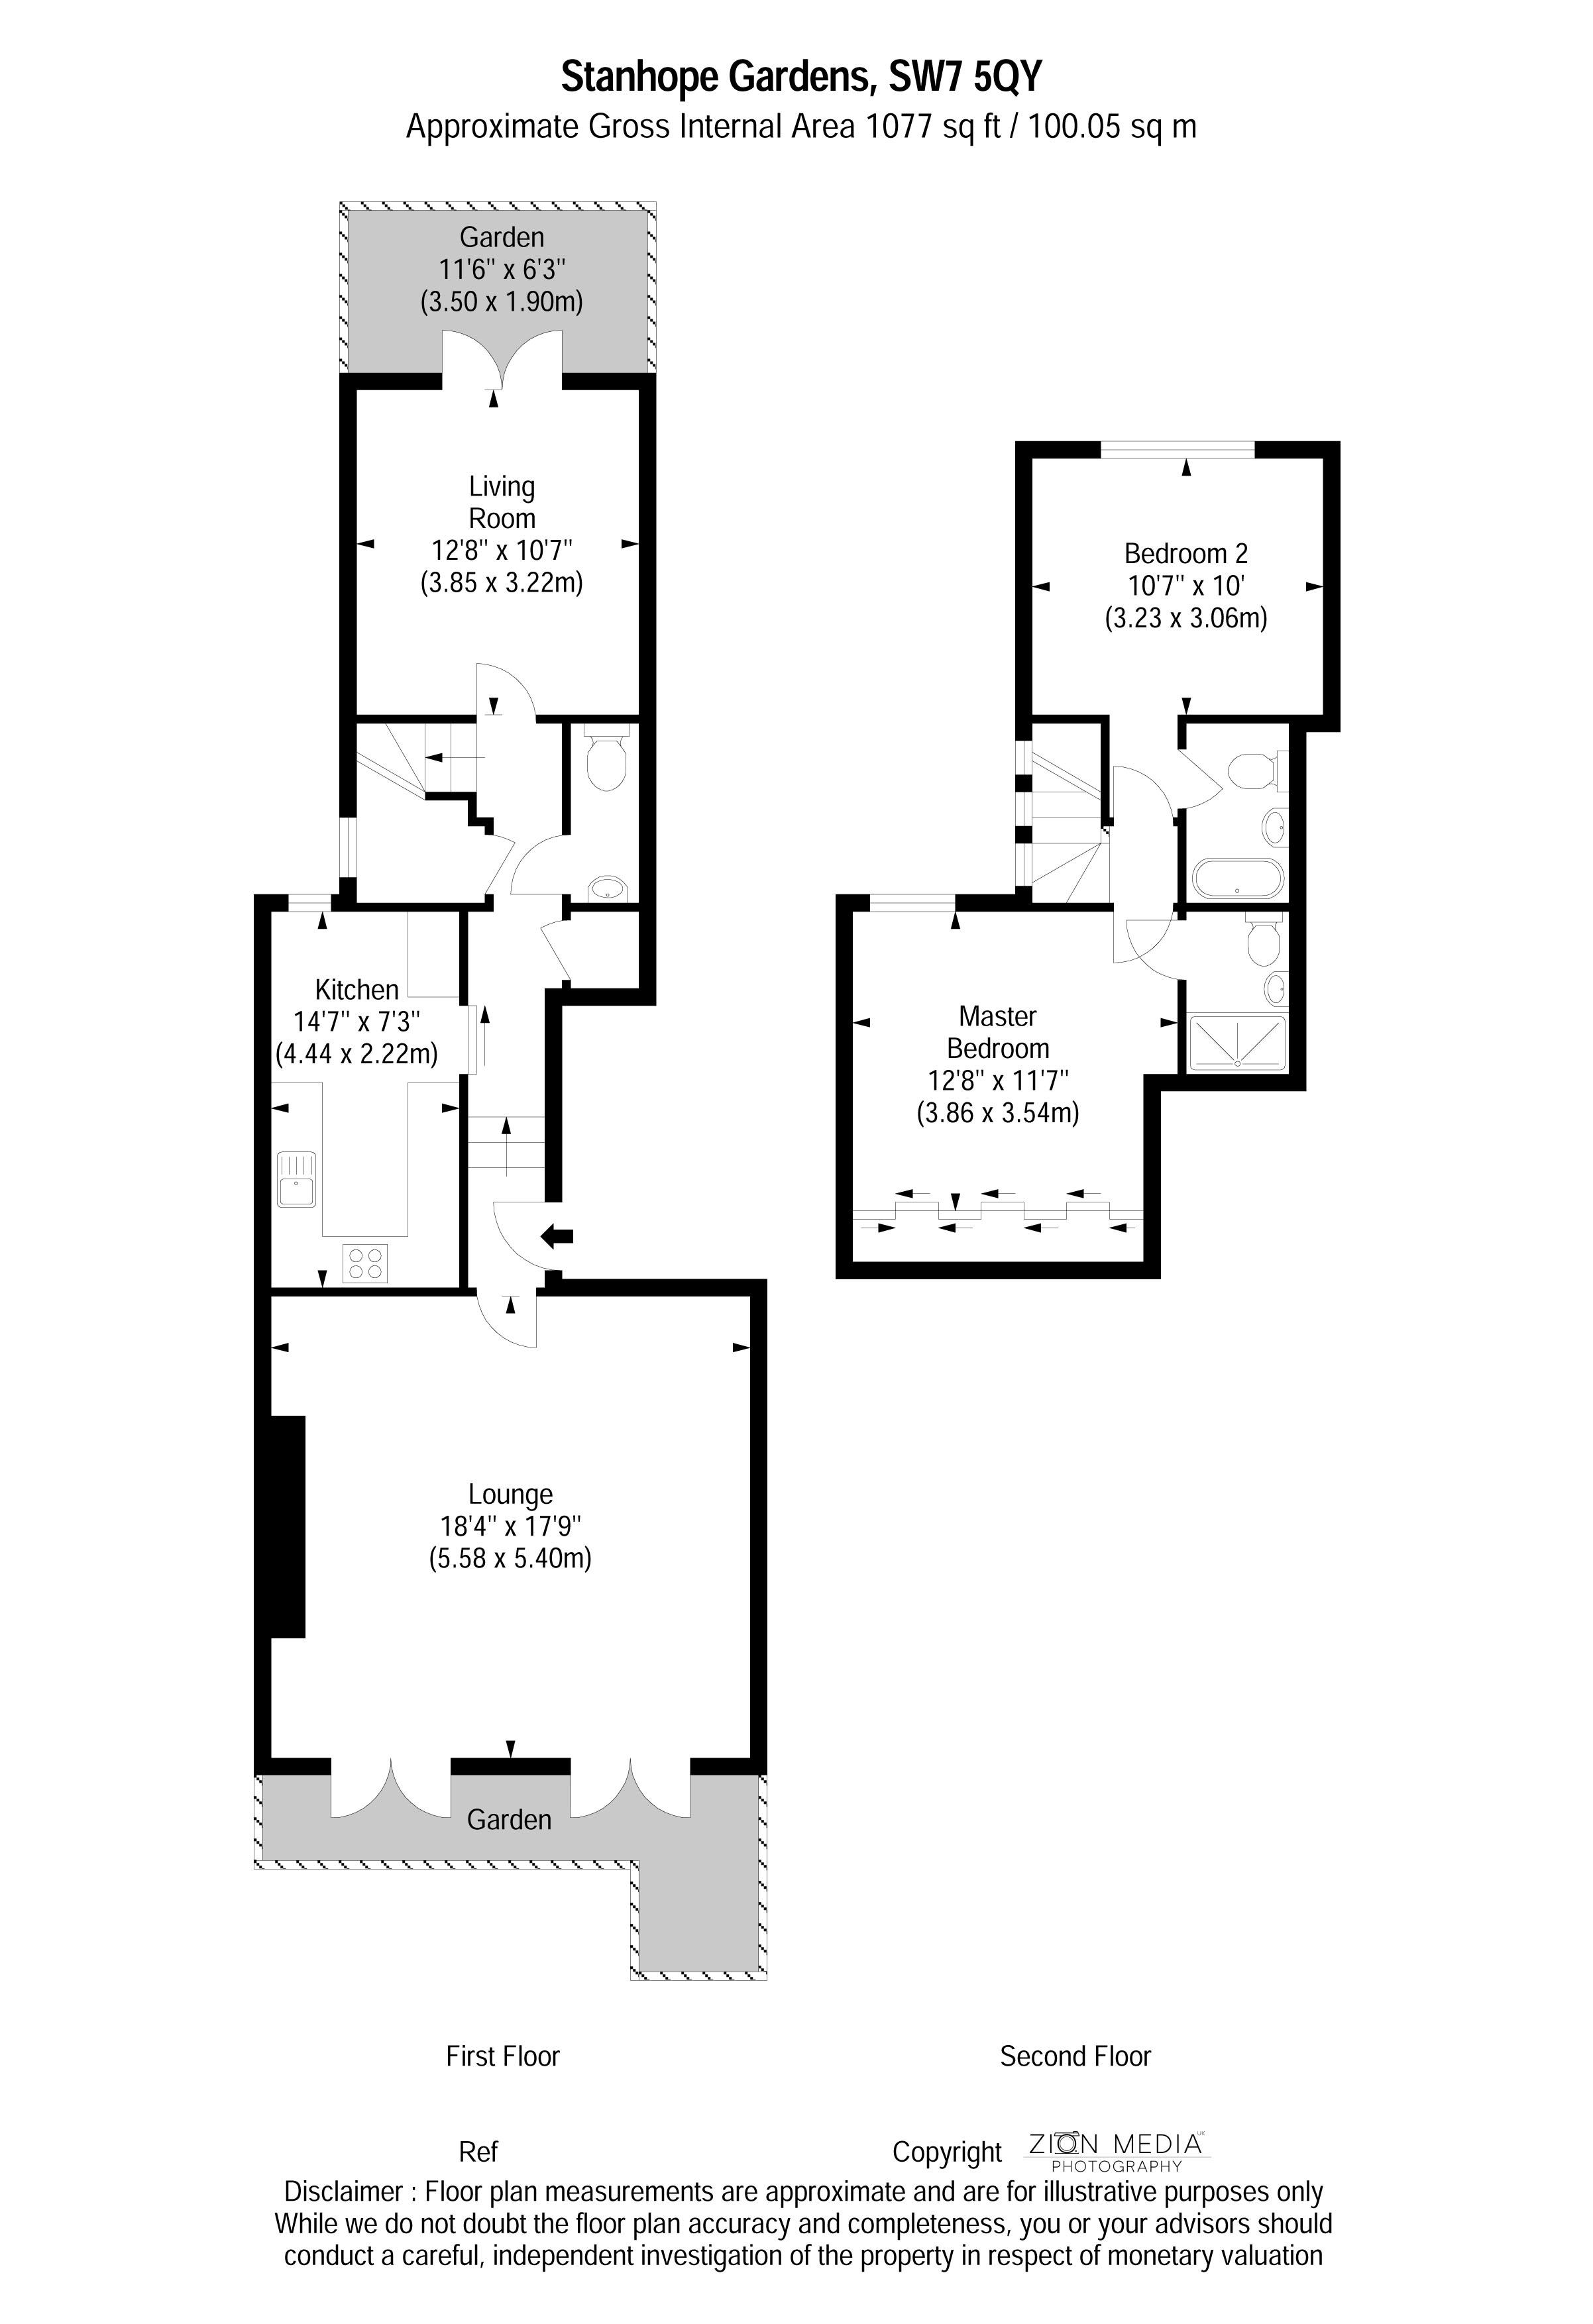 1 Bedrooms Maisonette to rent in Stanhope Gardnes, London SW7